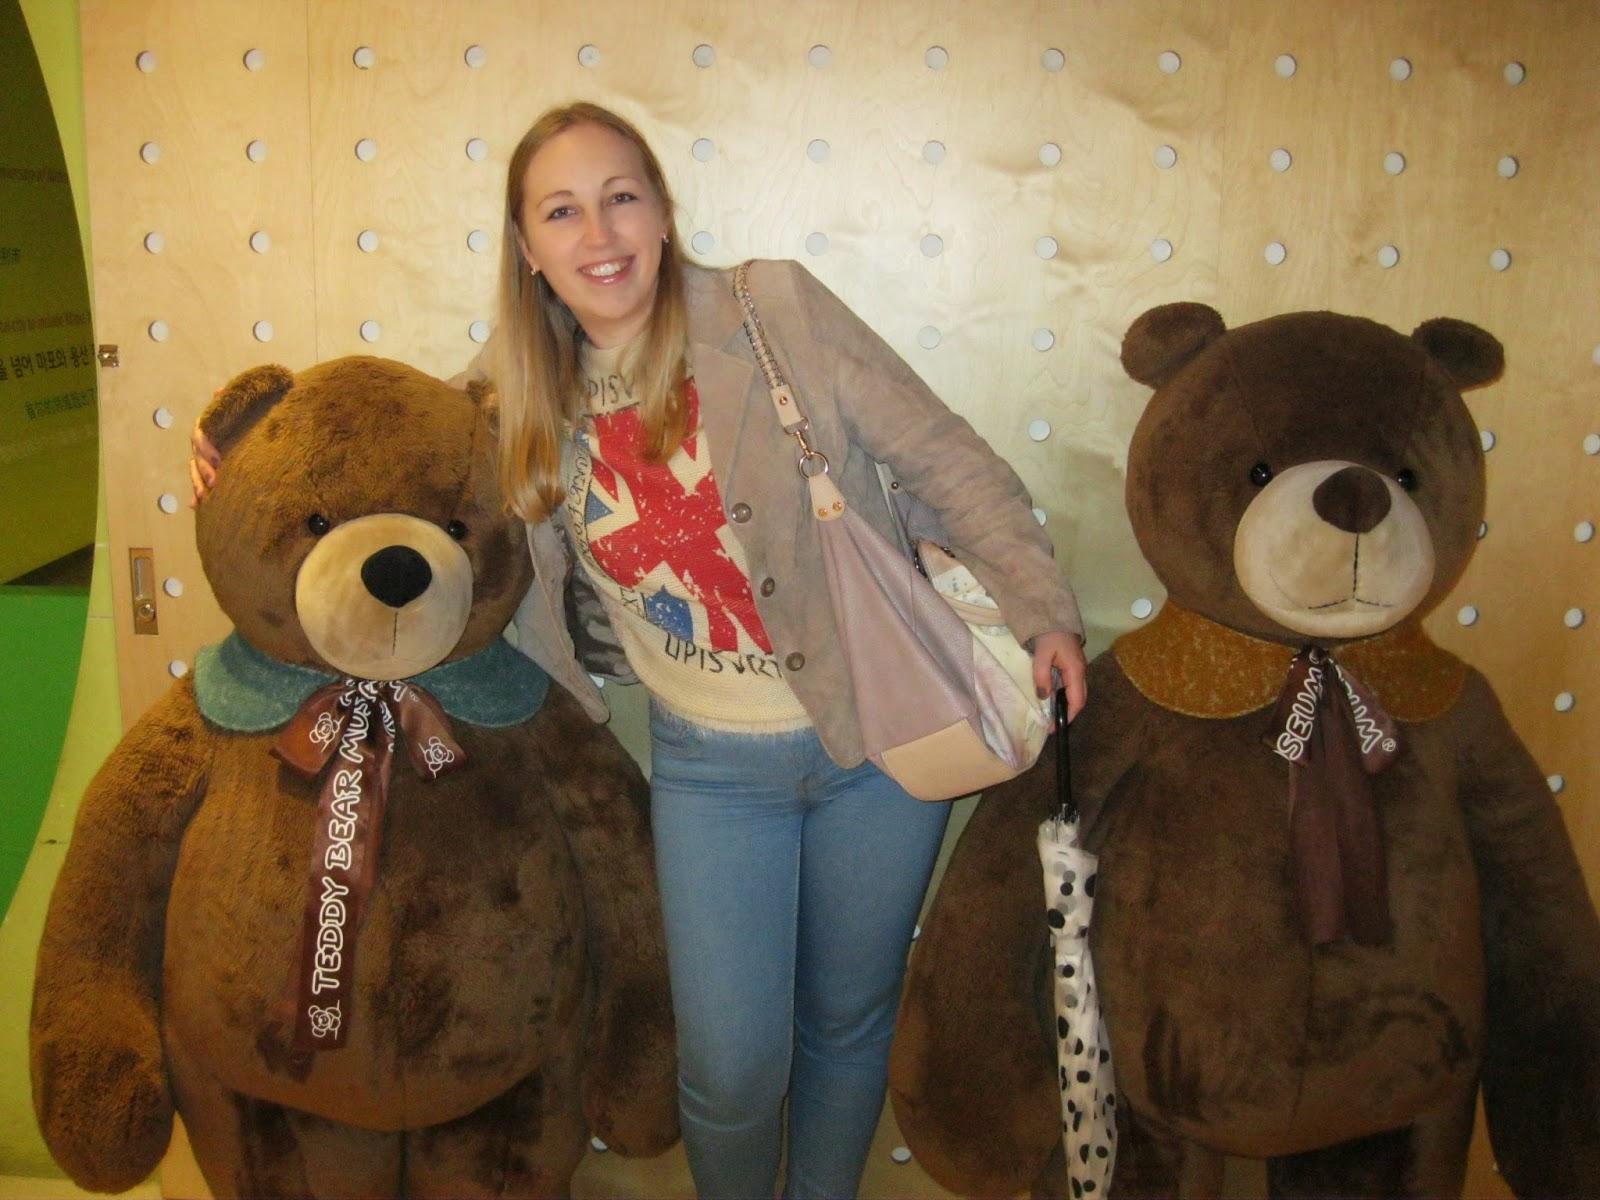 Teddy Bear Museum, мишки Тедди, Тедди, мишки, игрушки мишки